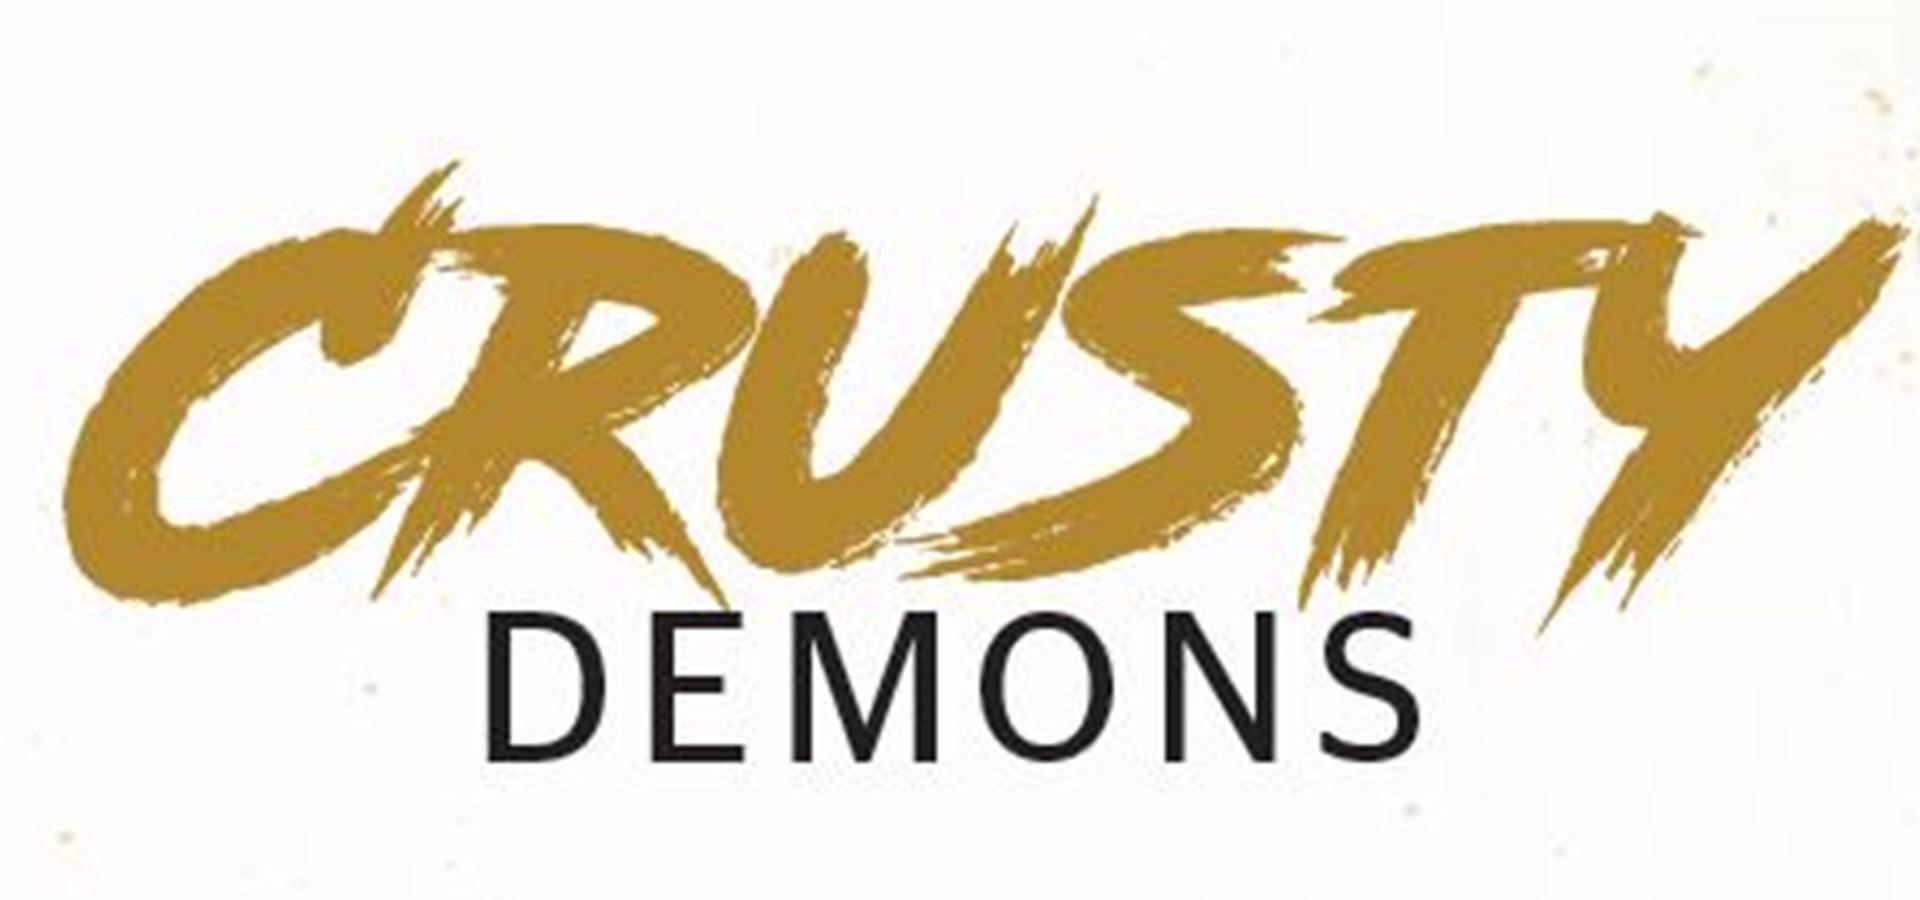 Crusty Demons Masters Bike Day | Summer Events | Cardrona NZ